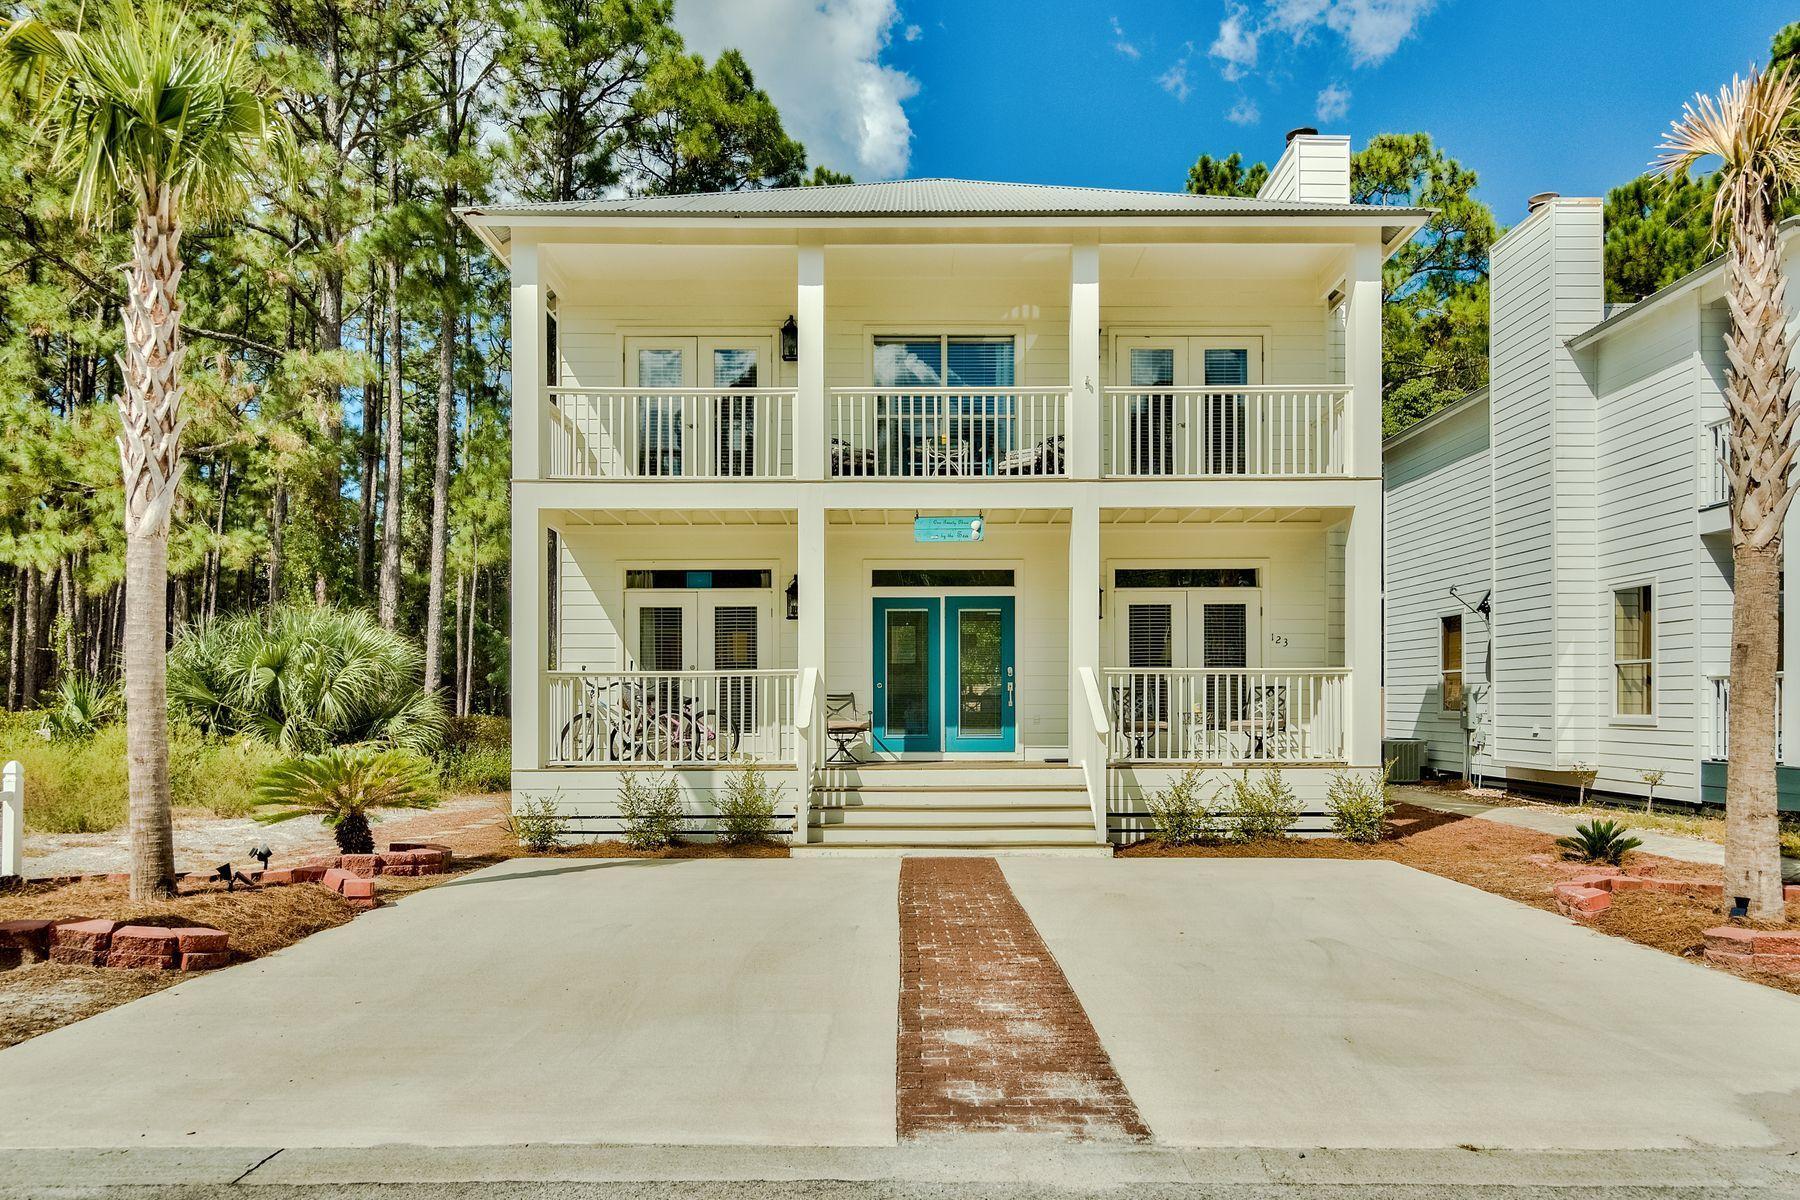 A 3 Bedroom 3 Bedroom Blue Gulf Resort Home